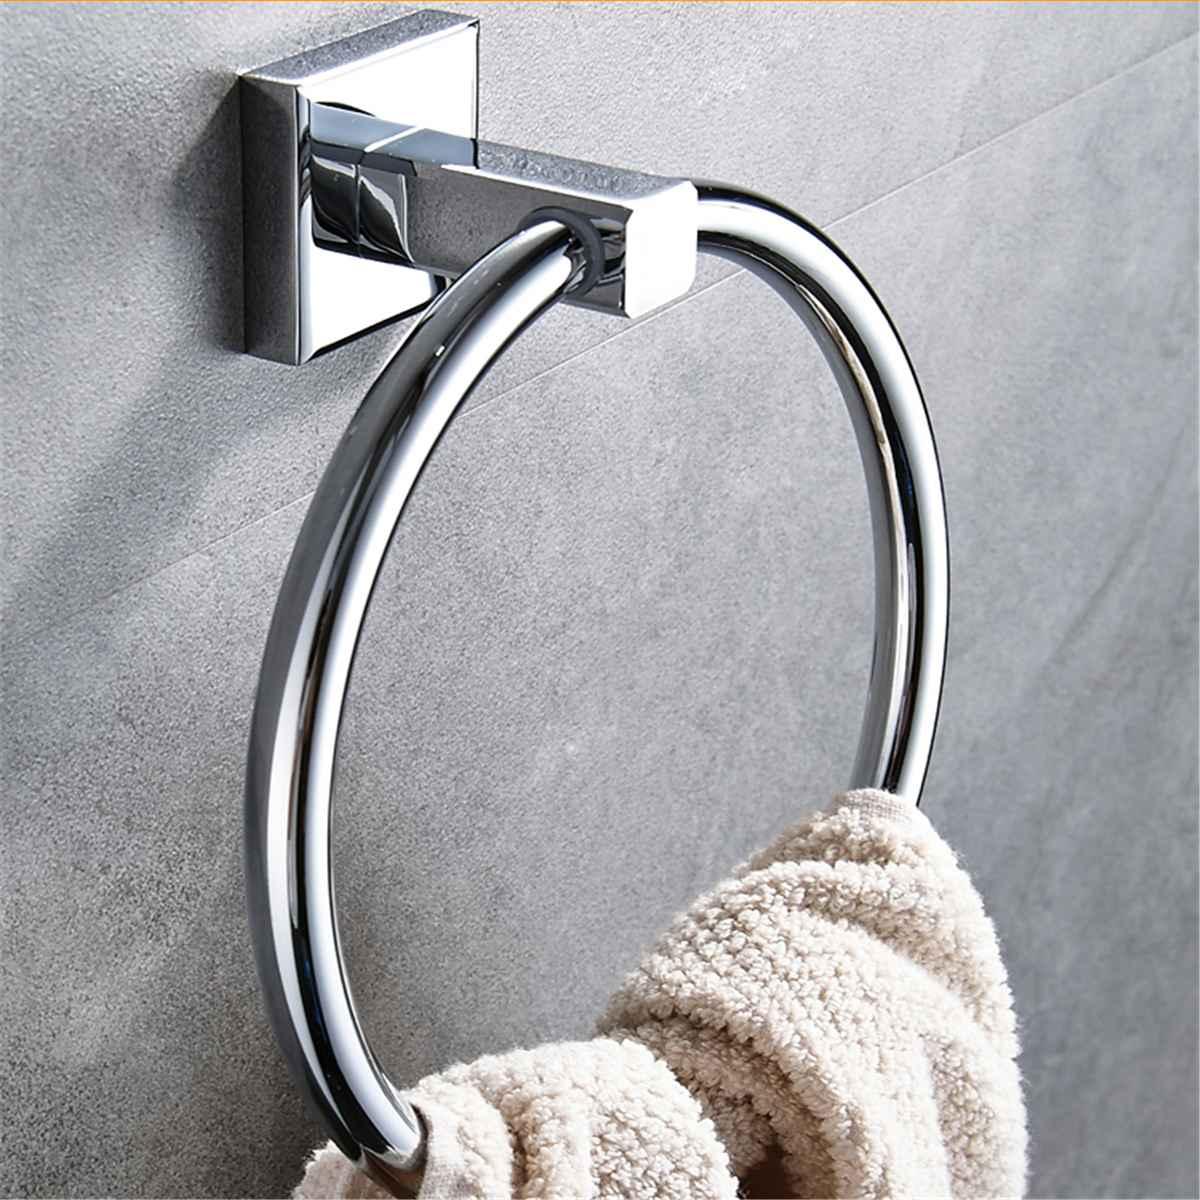 Stainless Steel Towel Ring Round Hanger Towel Holder Rack Wall-Mounted Hanging Towel Bar Bathroom Hardware Fixture Accessories